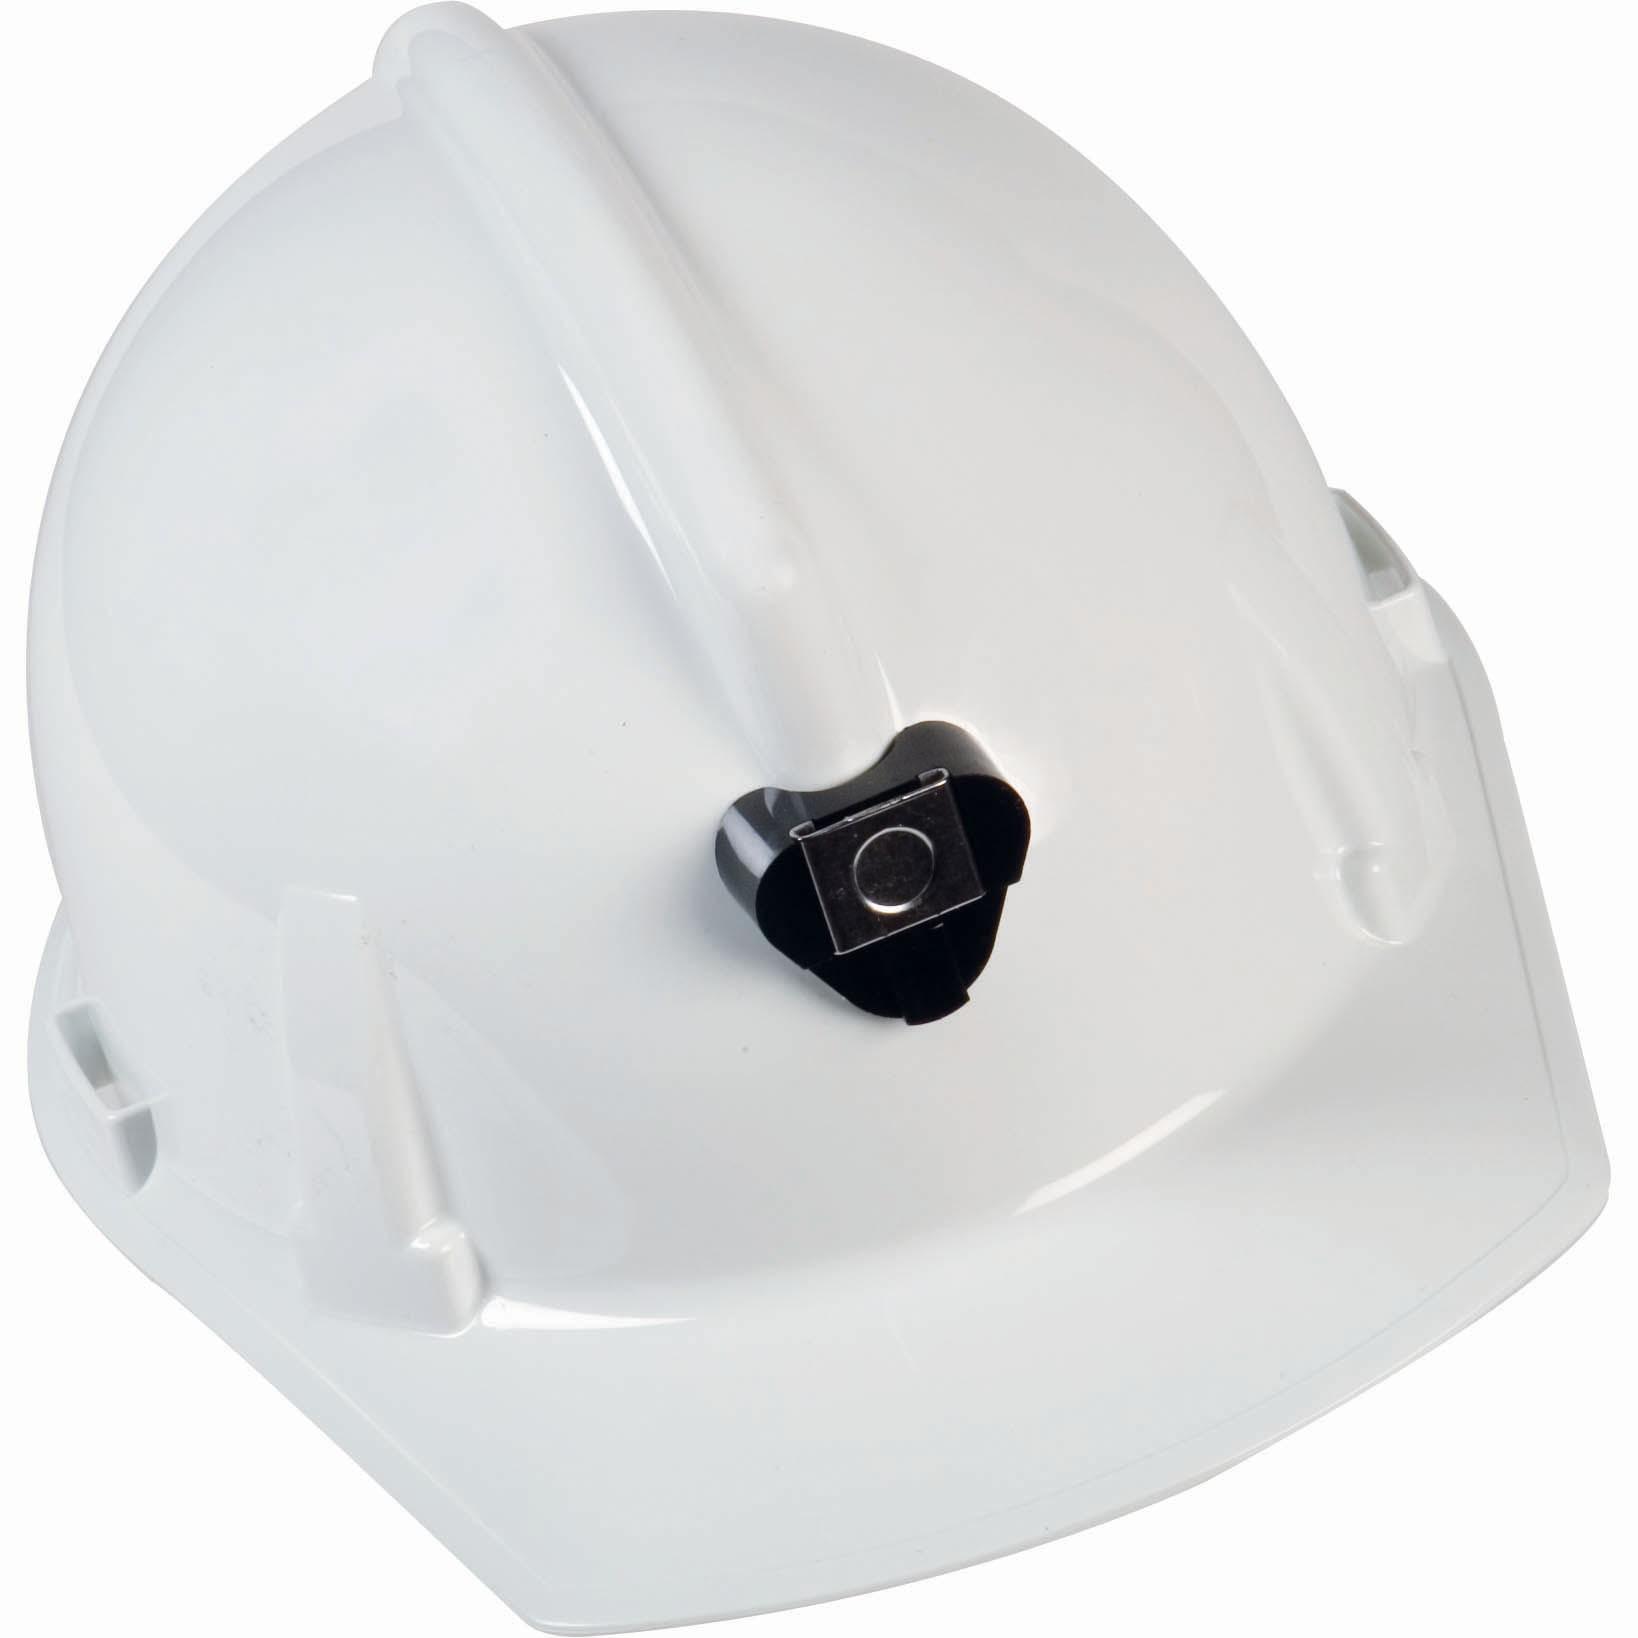 Msa 448914 Topgard Cap Style Hard Hat W Lamp Bracket 1